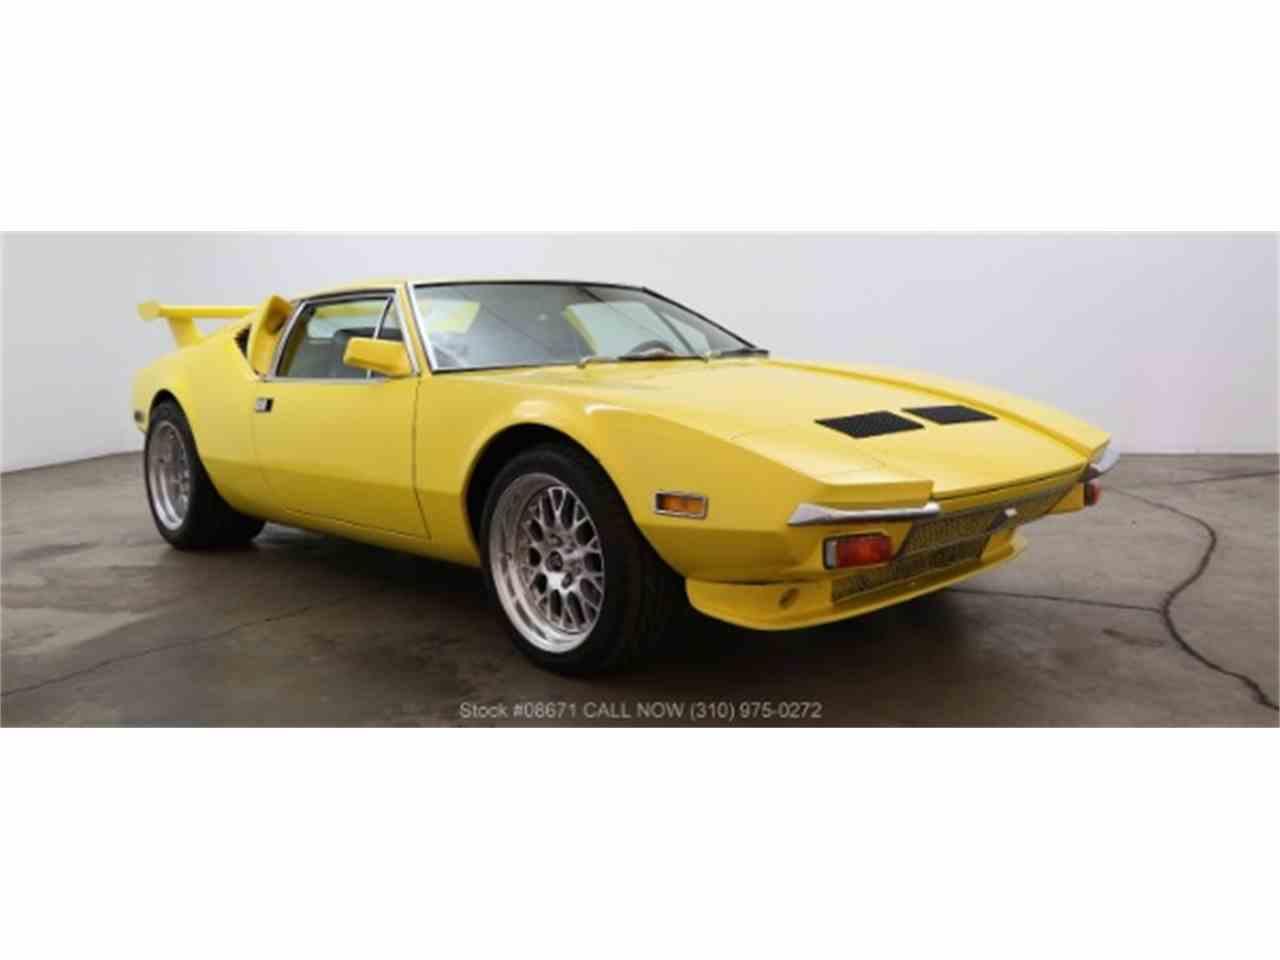 1972 De Tomaso Pantera for Sale - CC-1018375